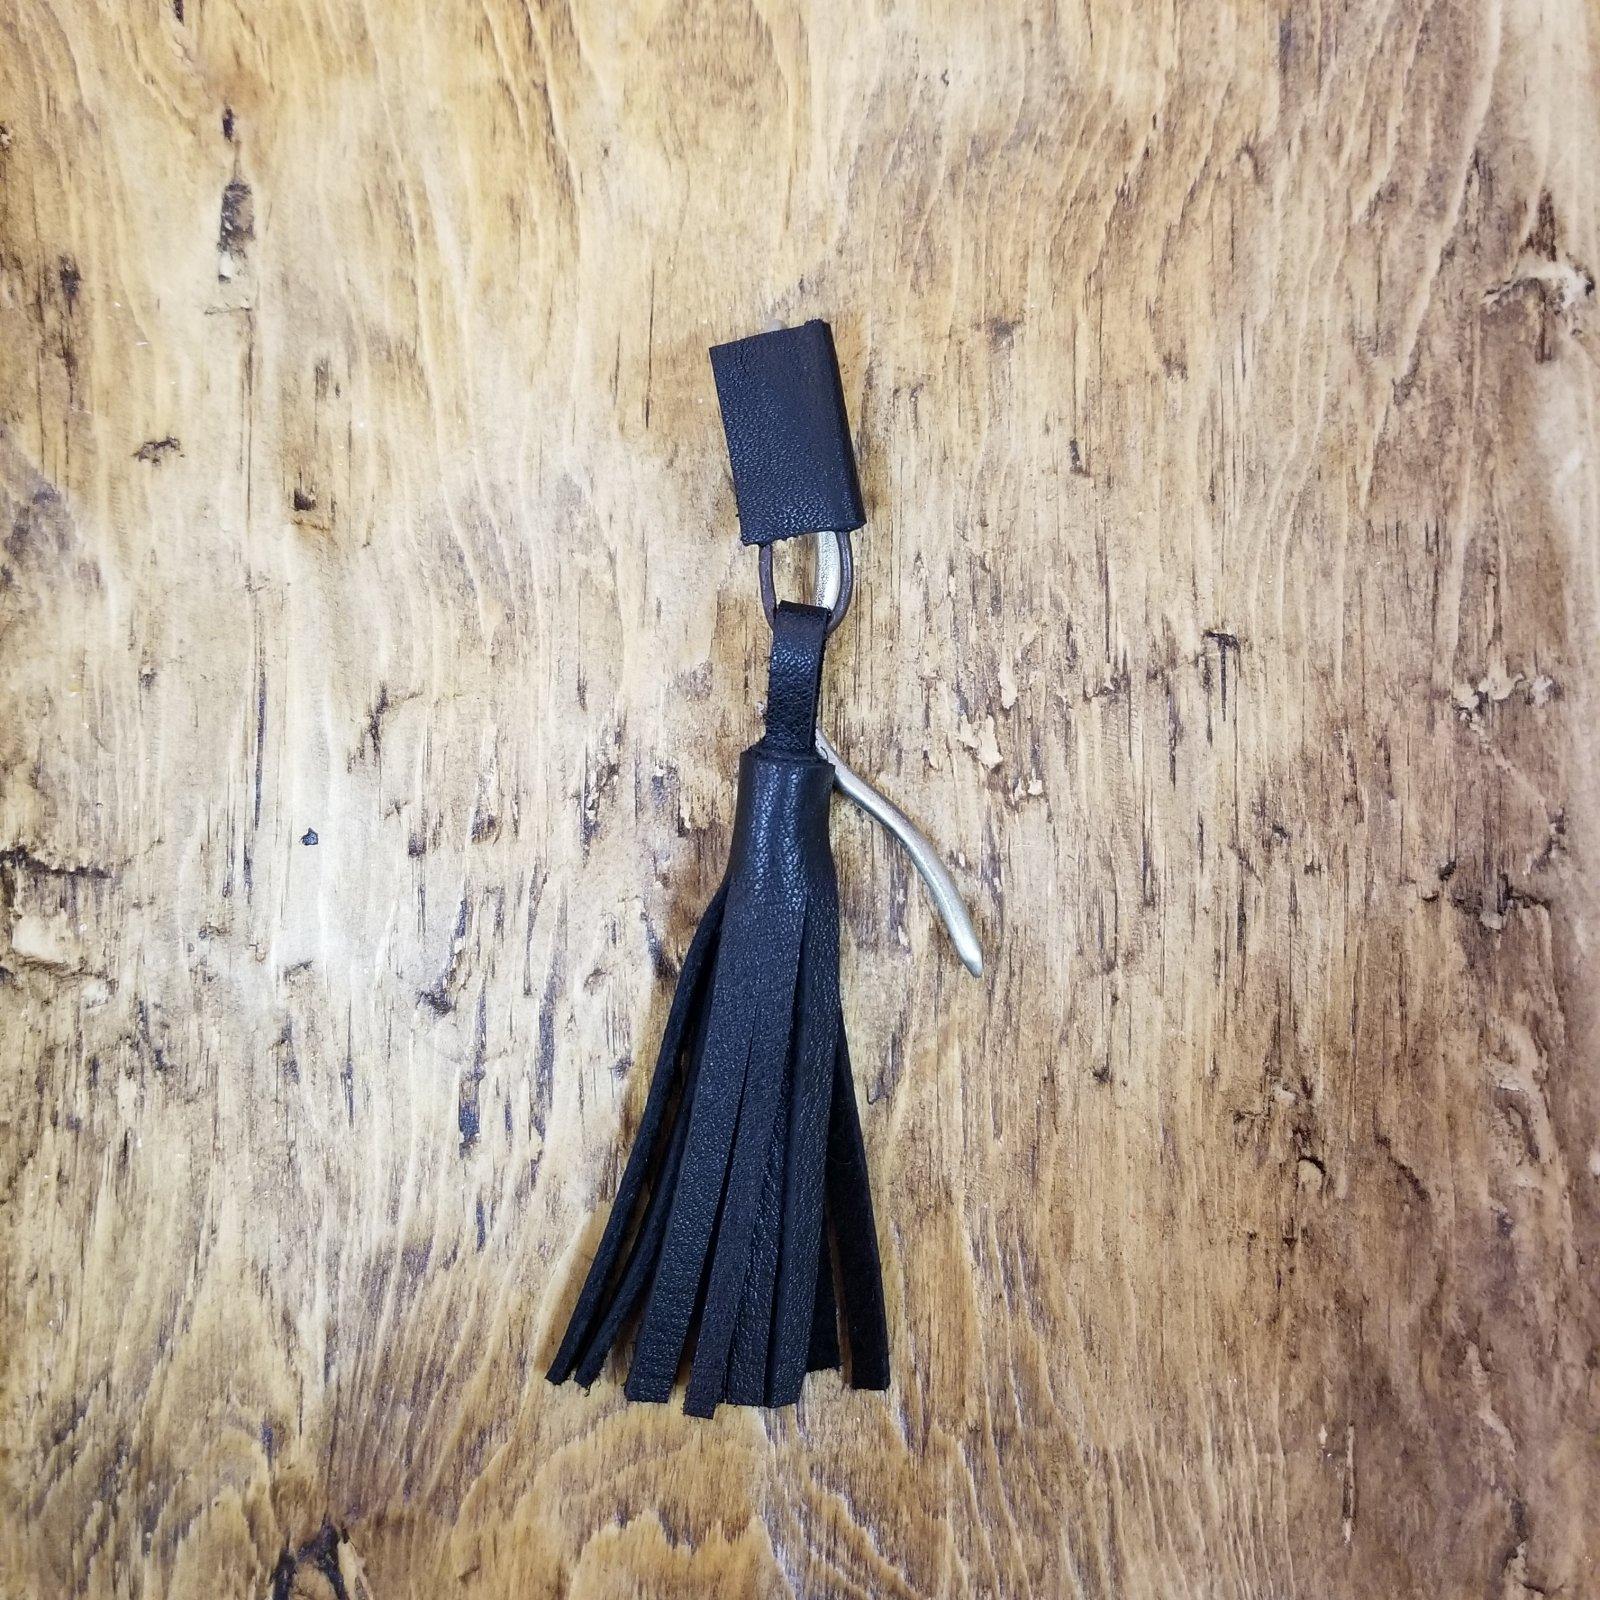 Color Stick Tassel Shawl Pin by Bonnie Bishoff